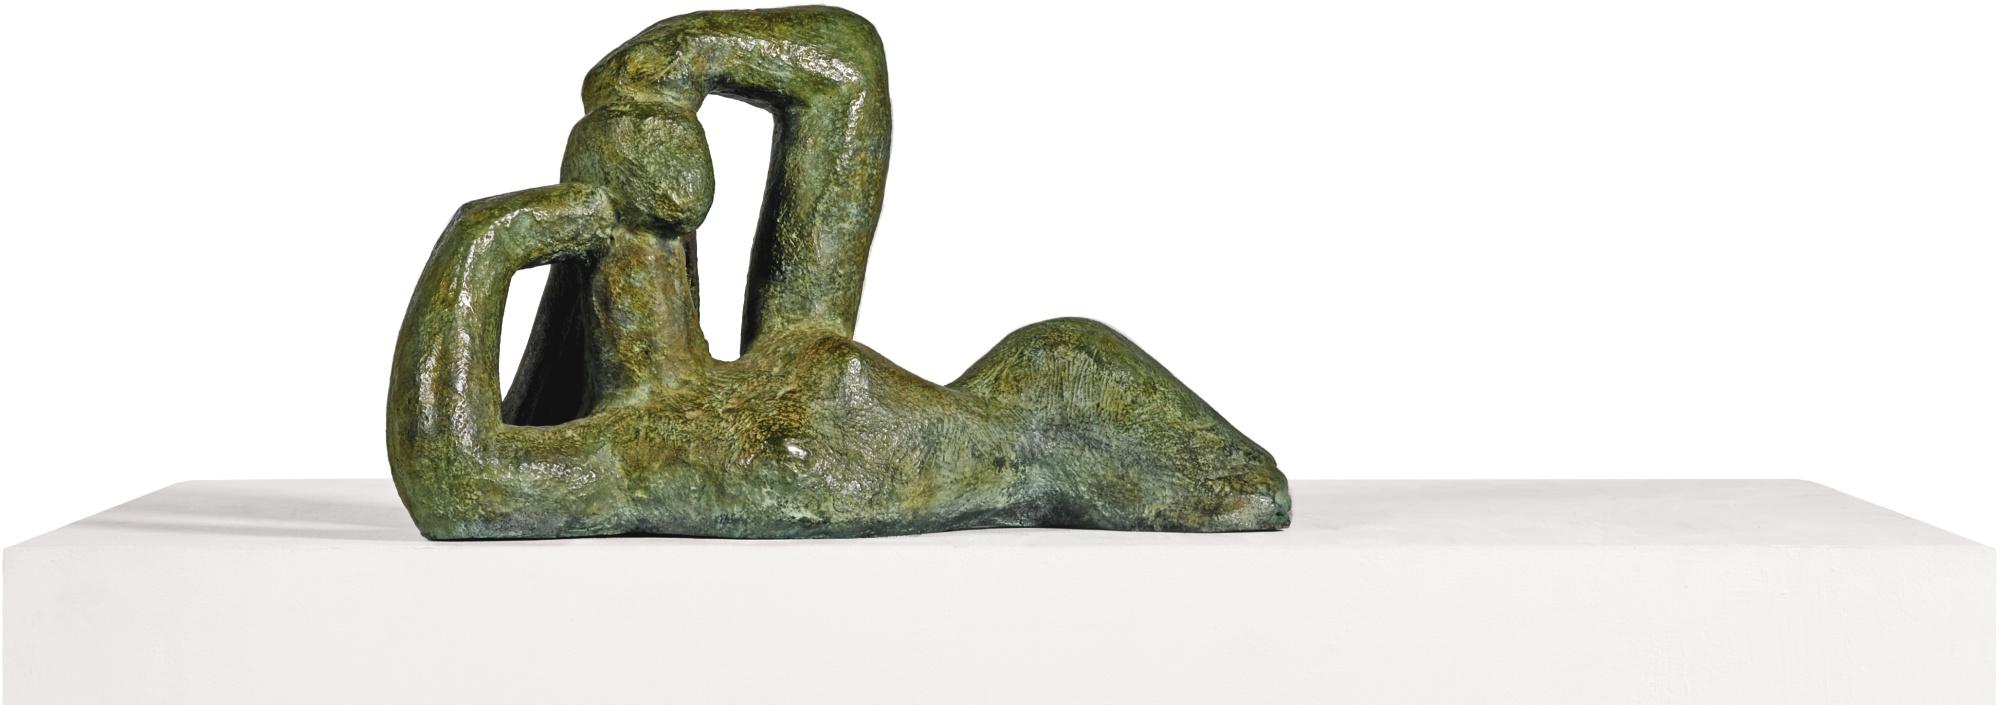 Ivor Abrahams-Eione Shore Goddess-1994